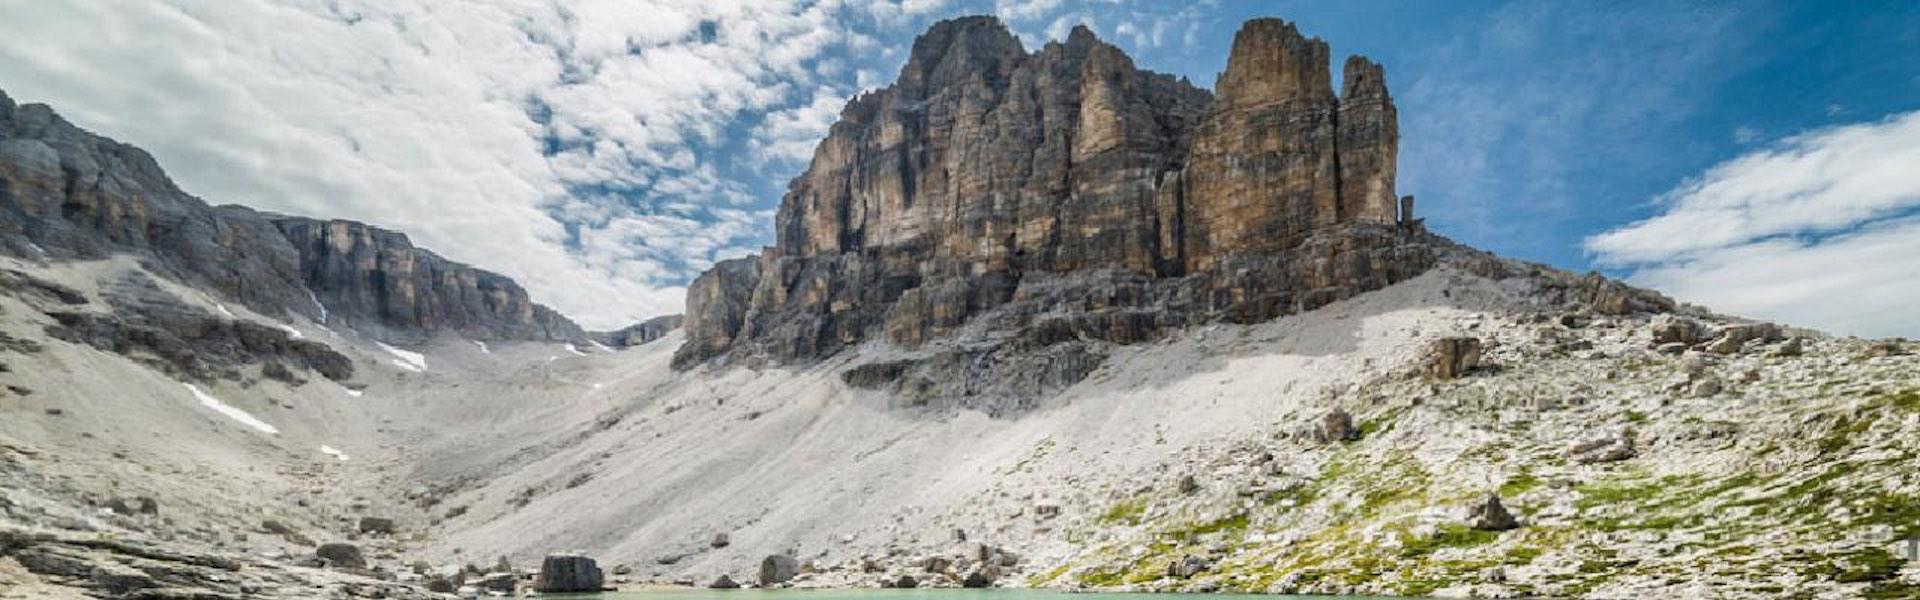 velo monaco | Dolomites